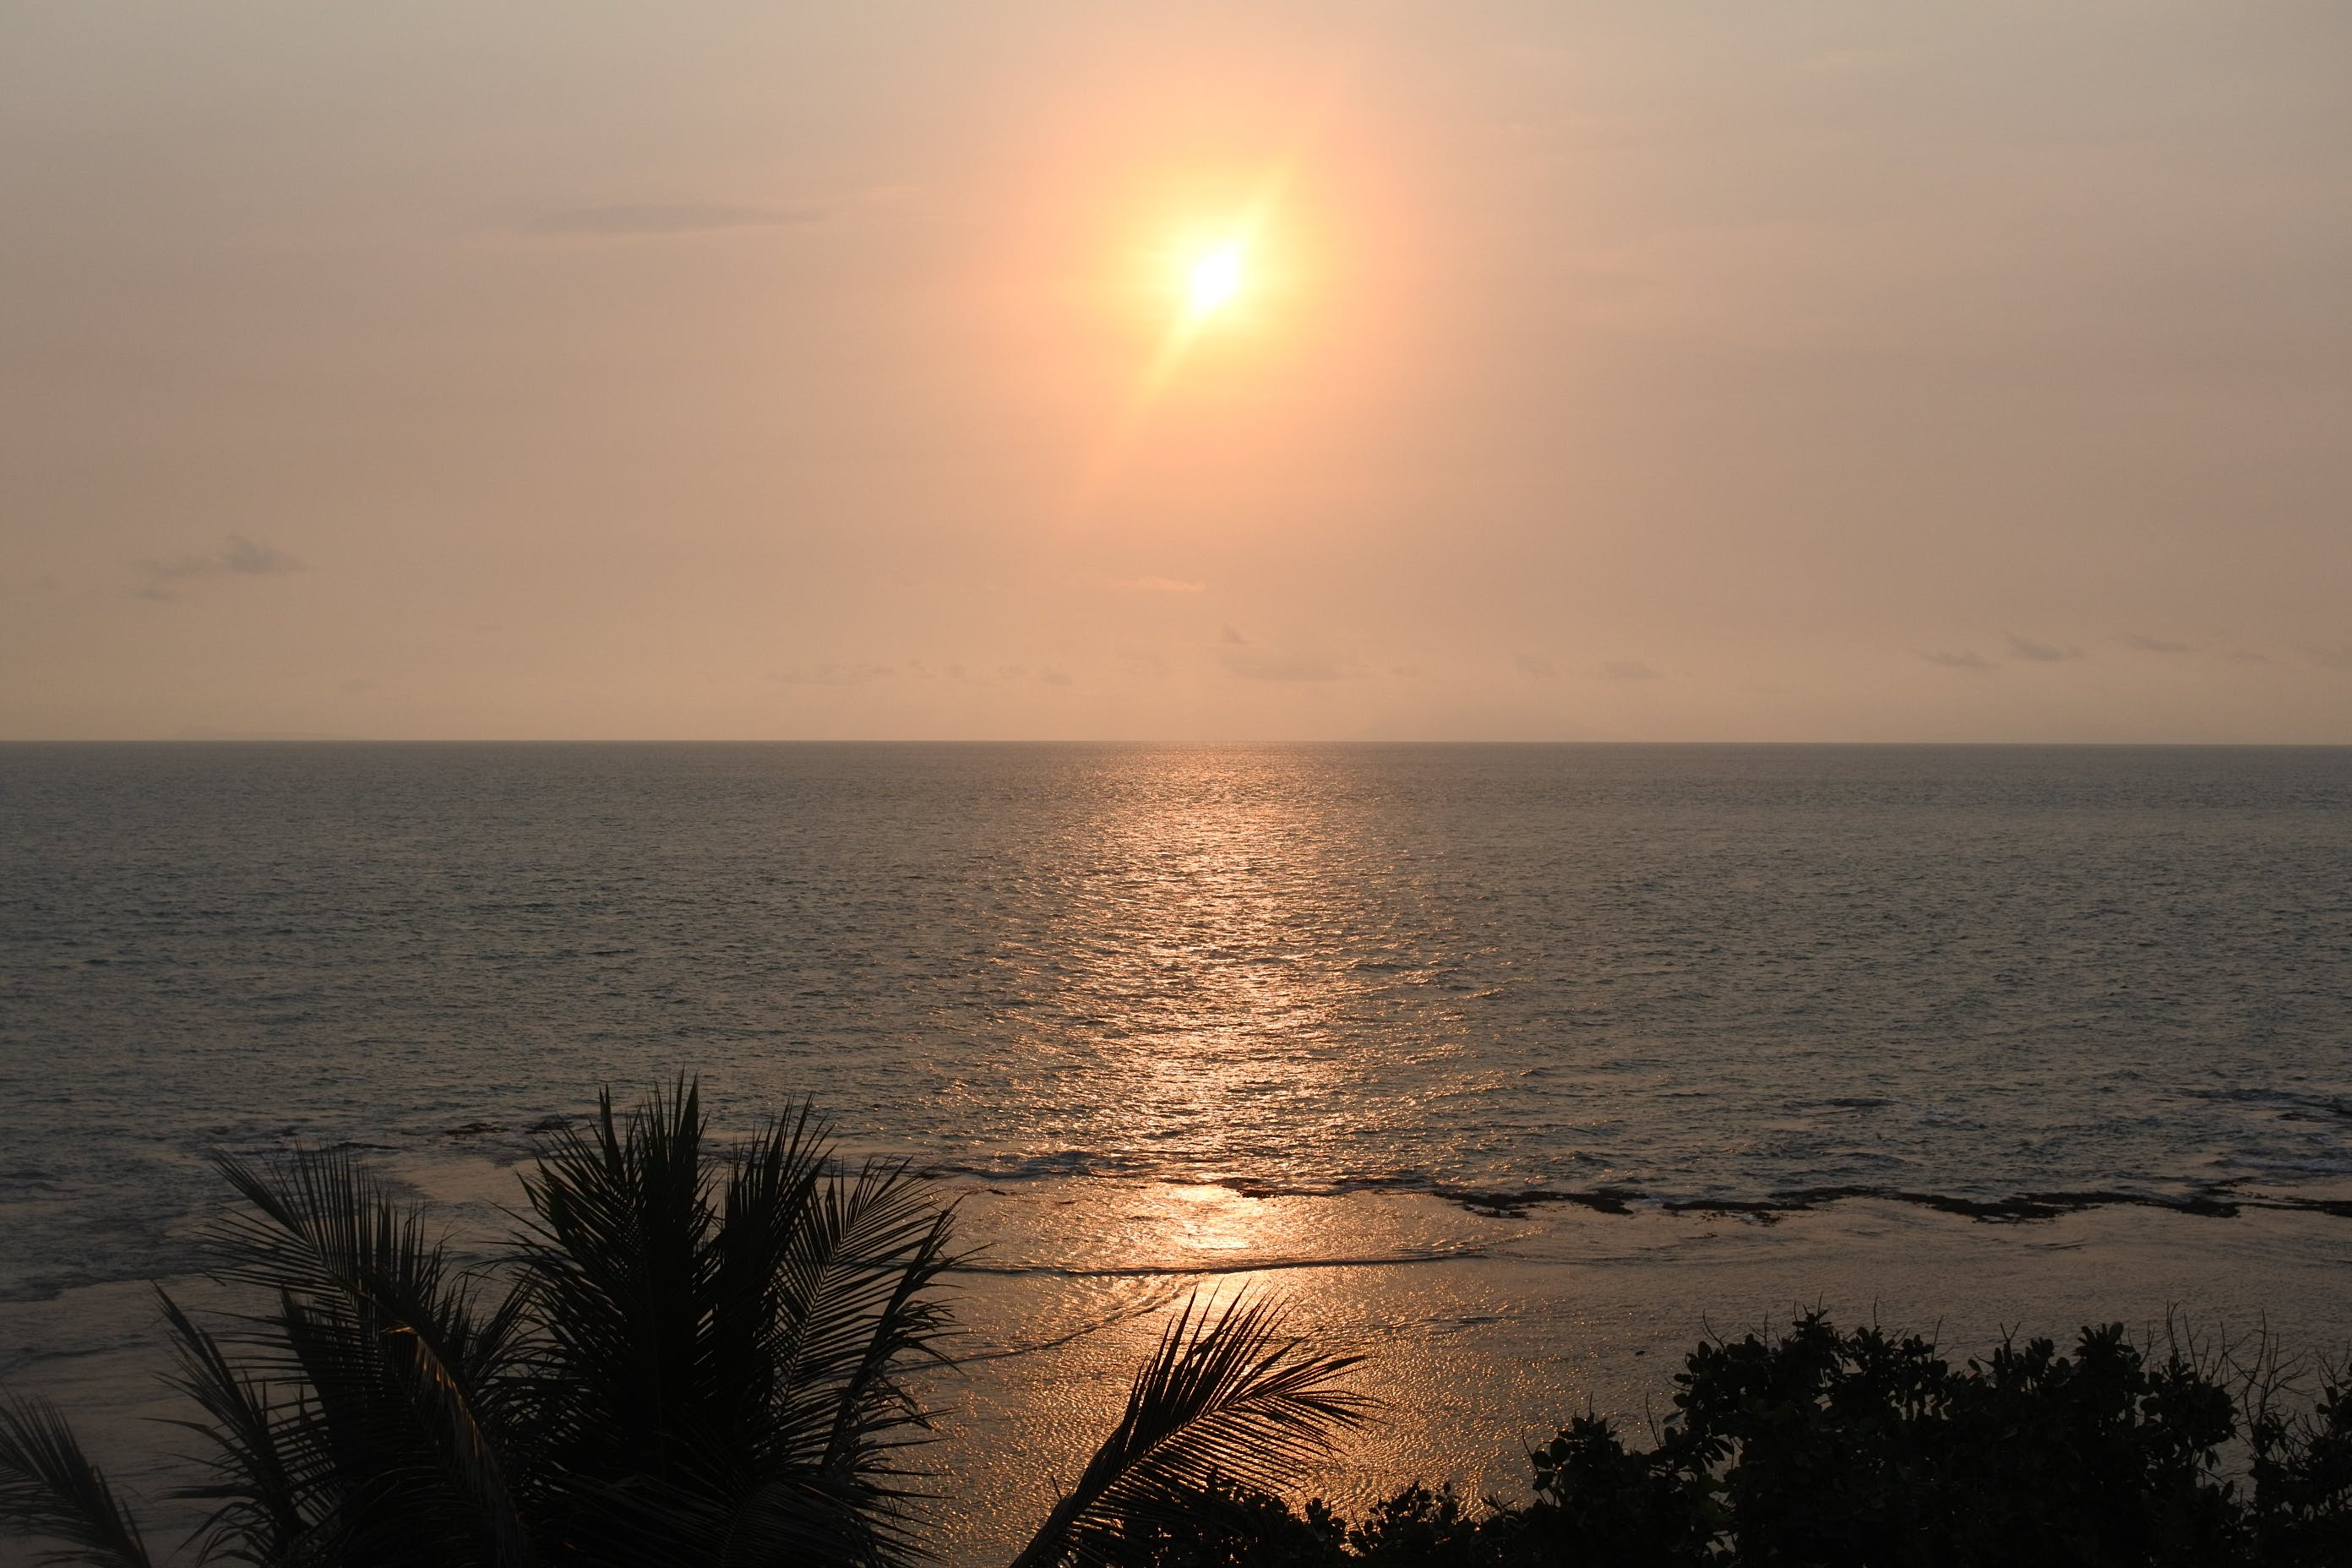 Free stock photo of beach, beautiful, cool, golden sunset